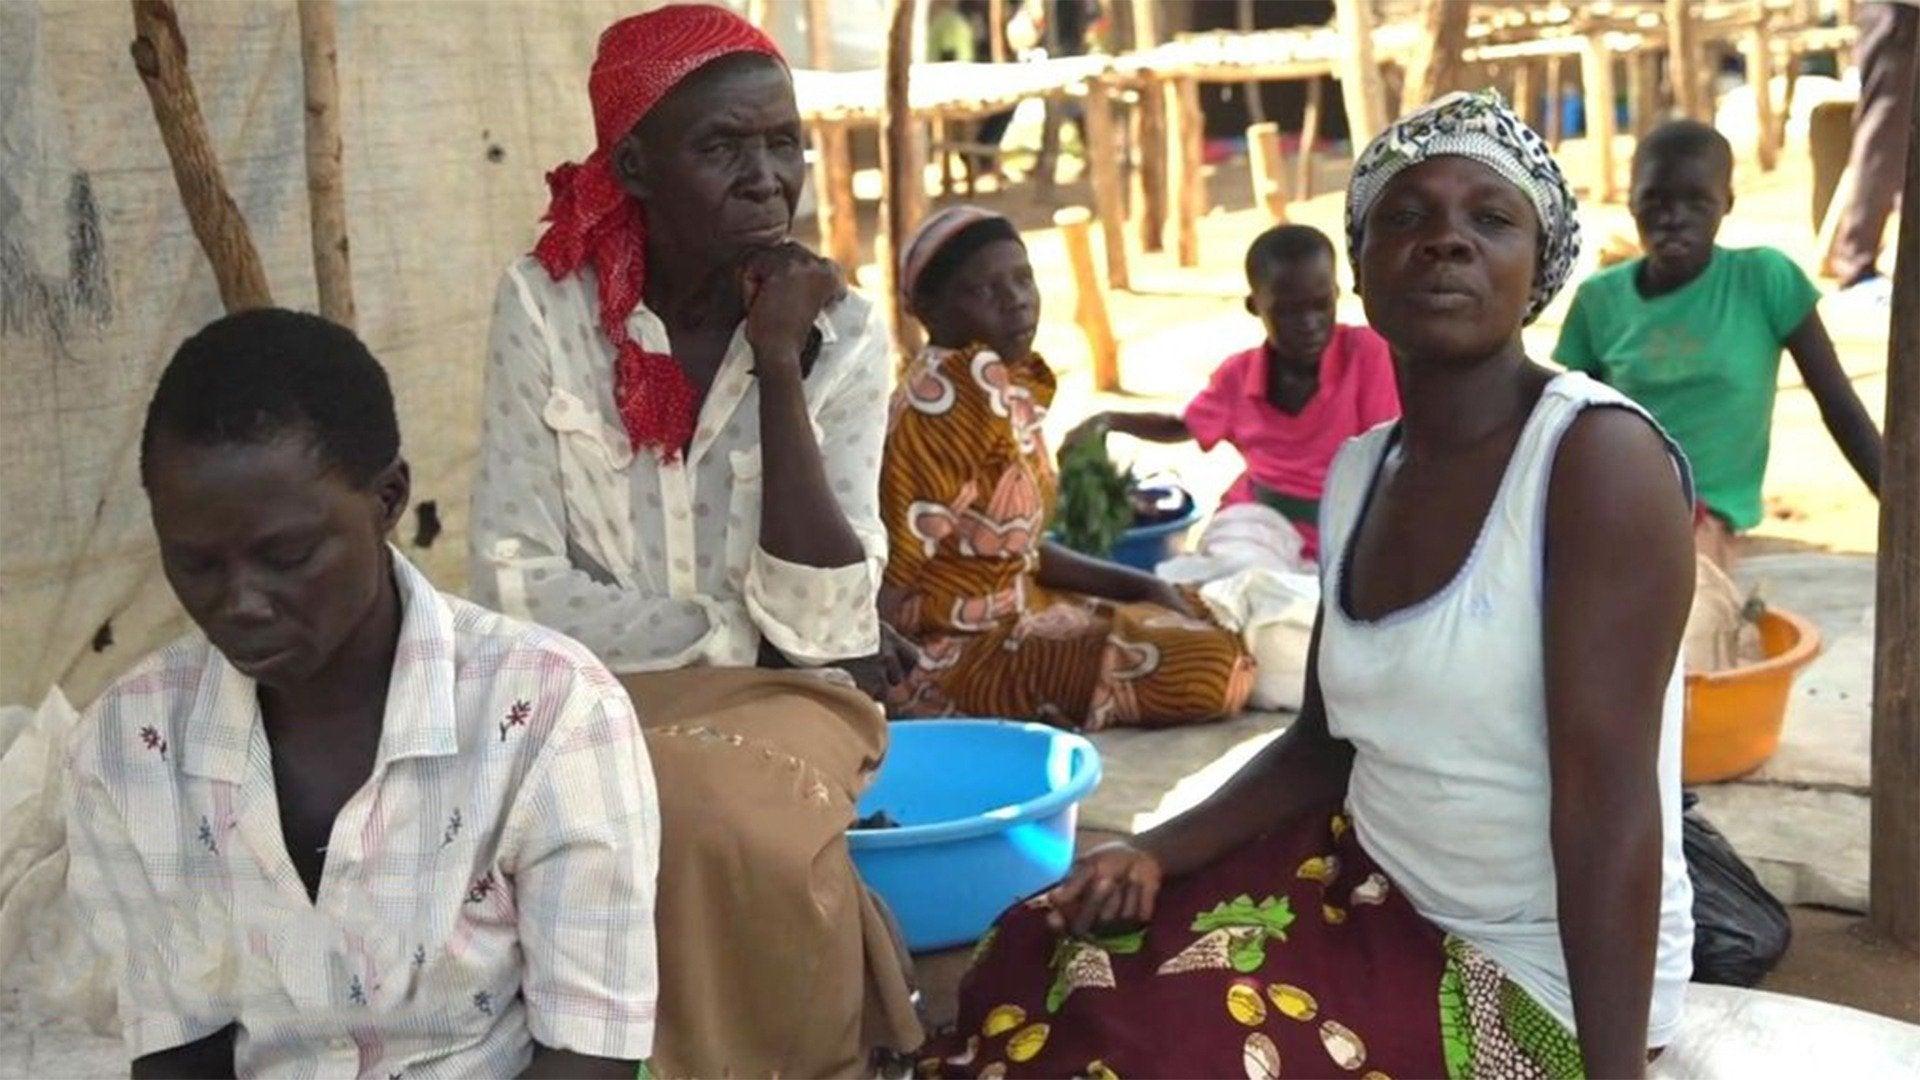 The Displaced Uganda